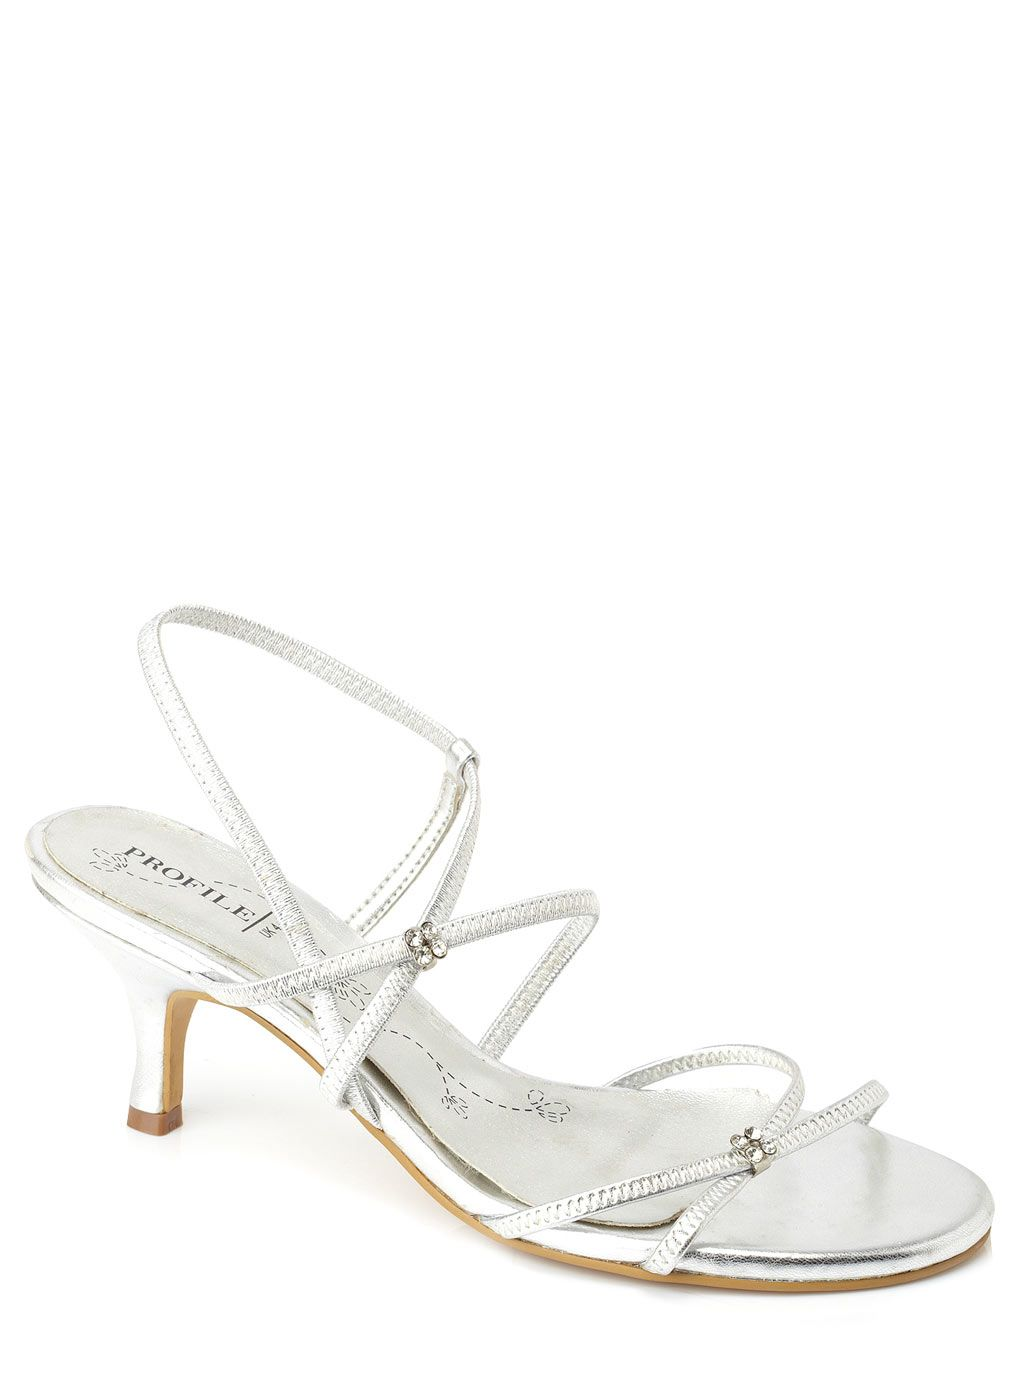 Silver Diamante Strappy Sandal 23 Bridesmaid Shoes Heels Shoes